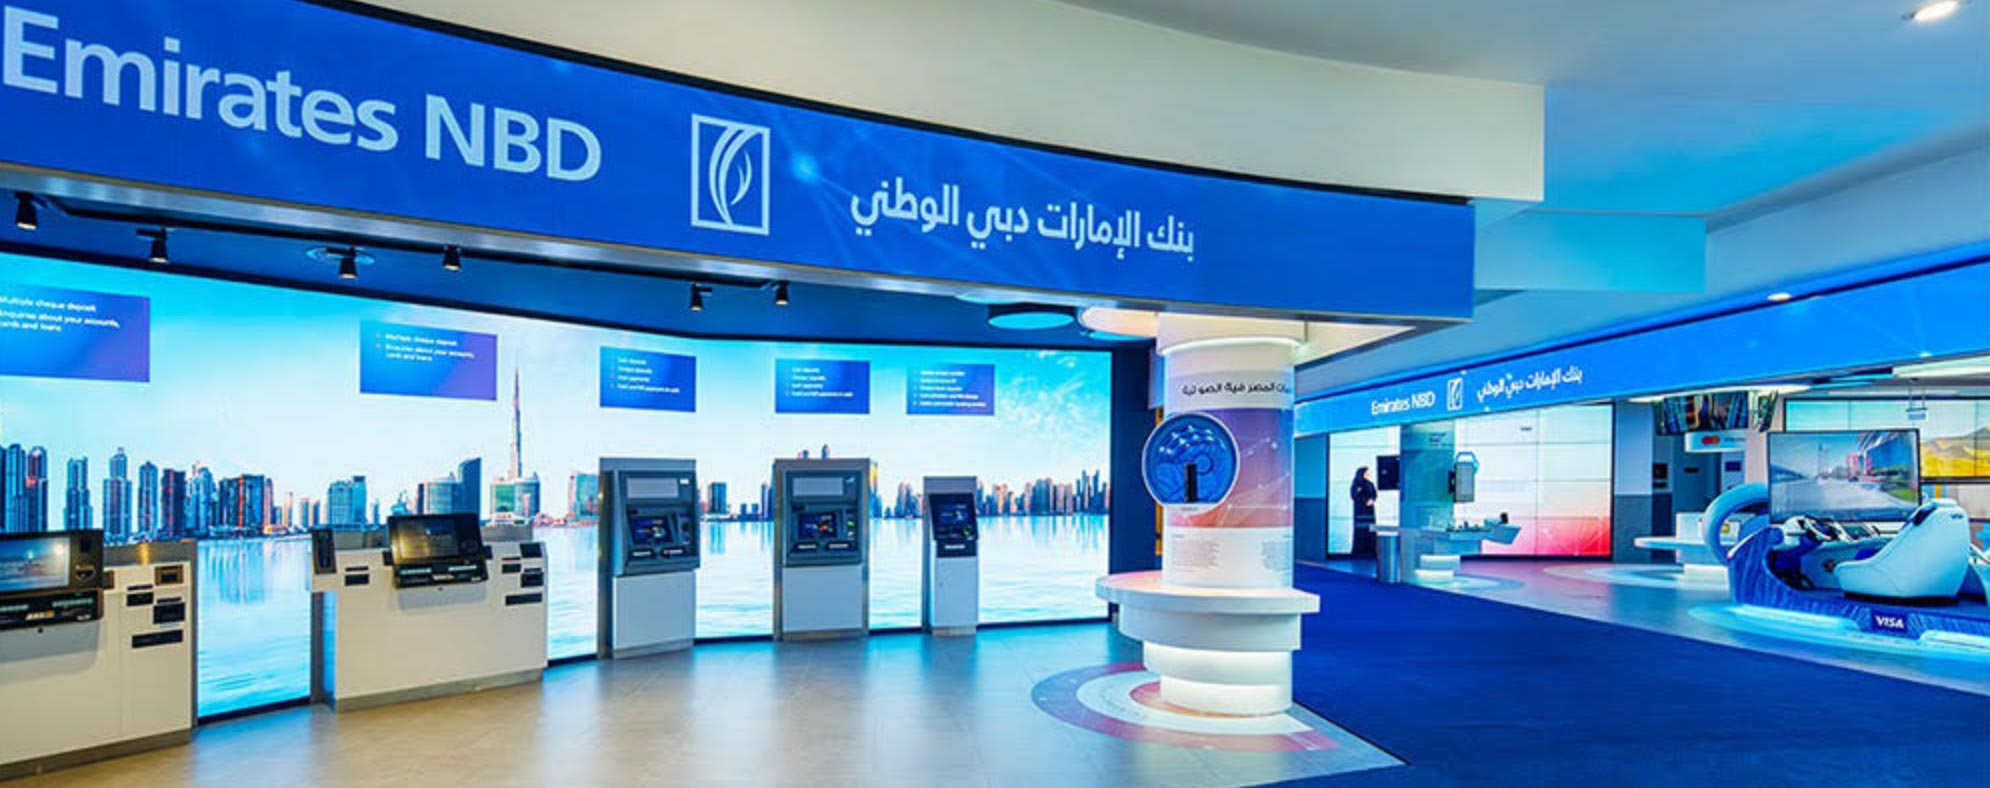 emirates-nbd-kiosks.jpg